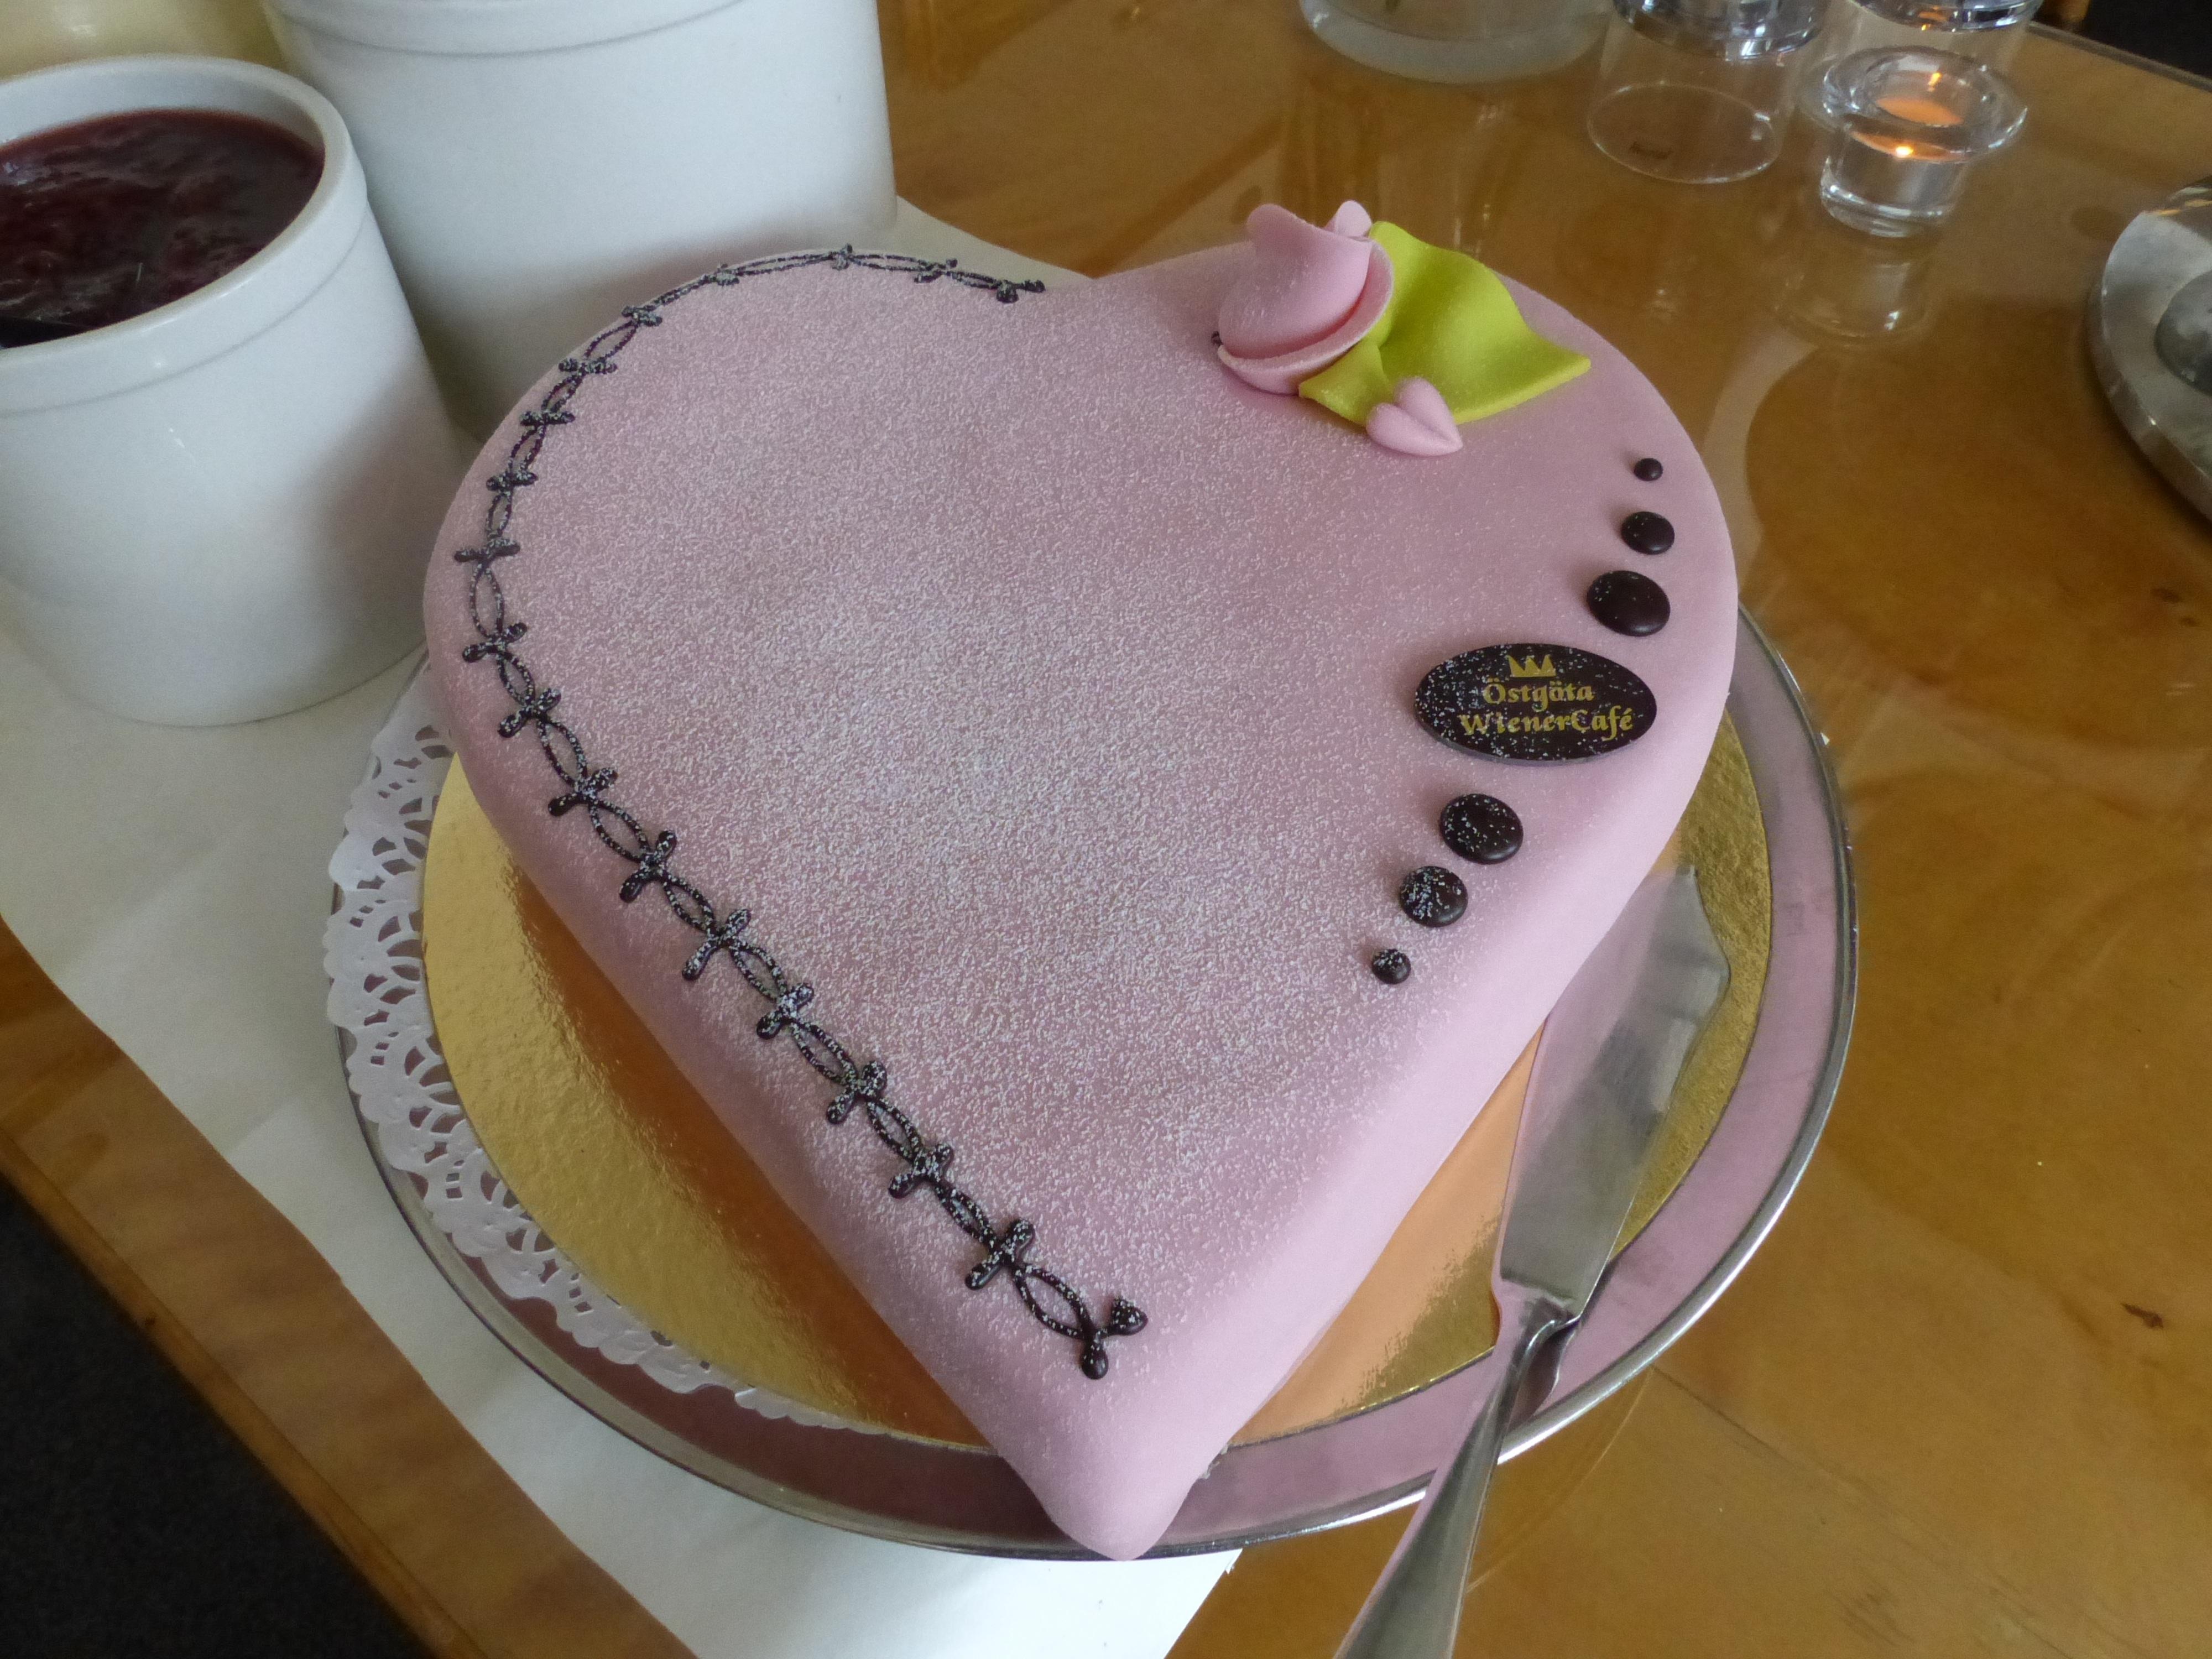 fotos gratis mesa comida rosado horneando postre cocina barril pastel de cumpleaos formacin de hielo fondant ros productos horneados